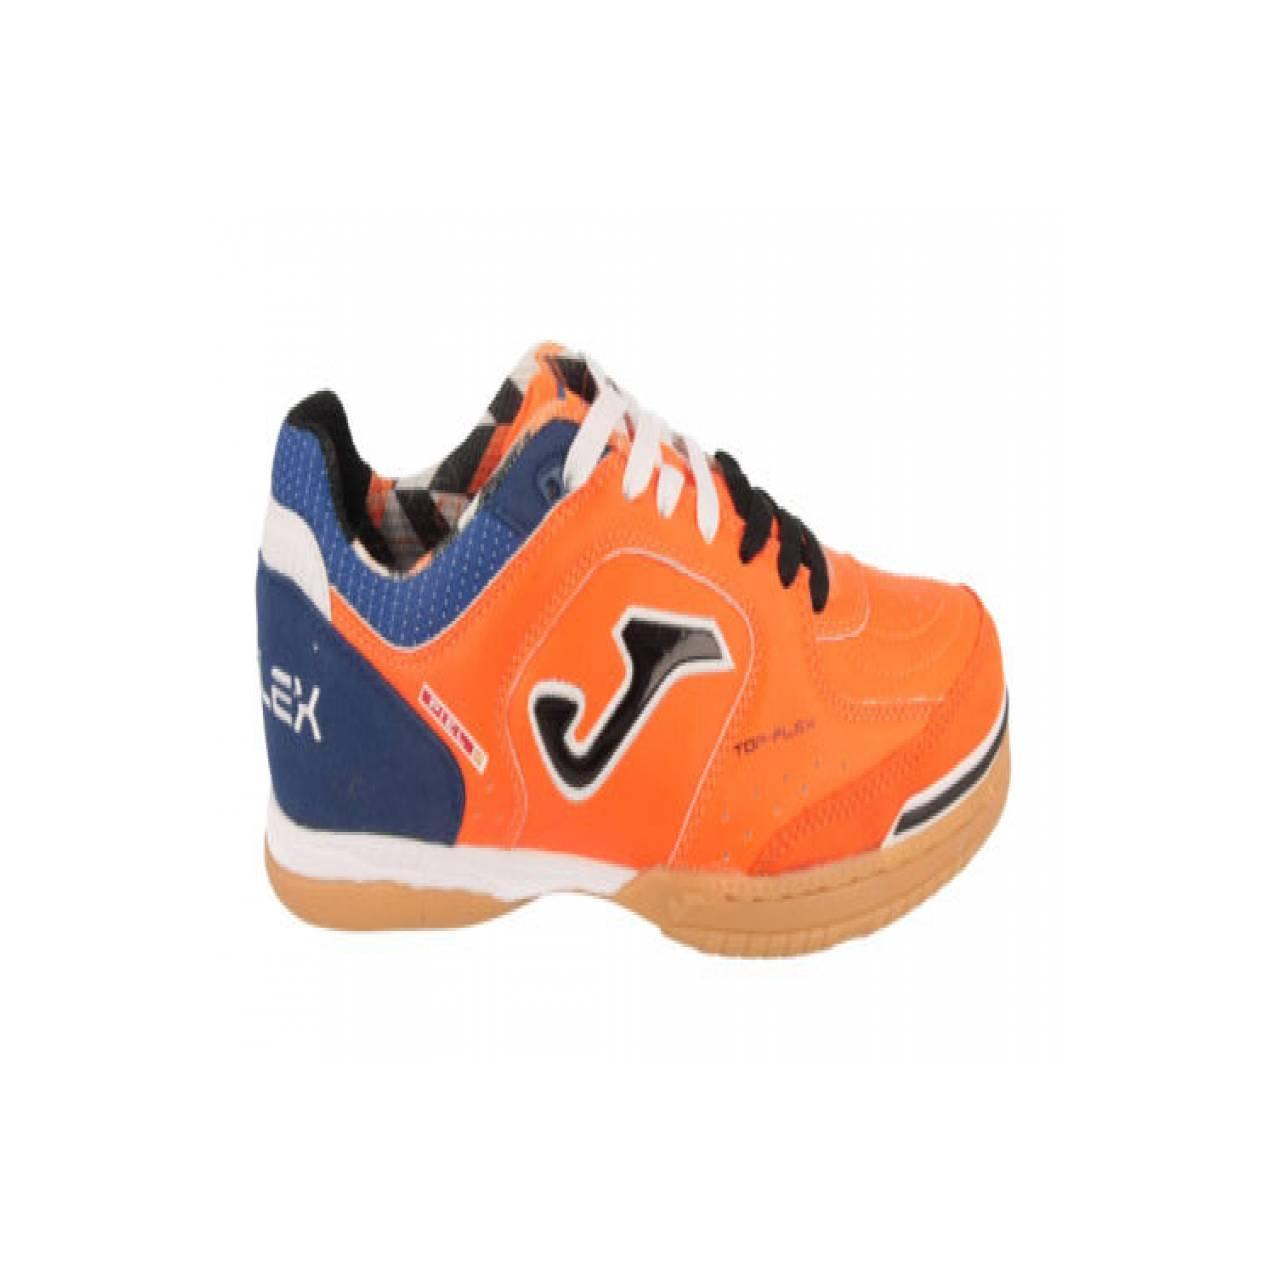 sepatu - SCARPE CALCETTO / FUTSAL INDOOR JOMA TOP FLEX 608 ORANGE-NAVY